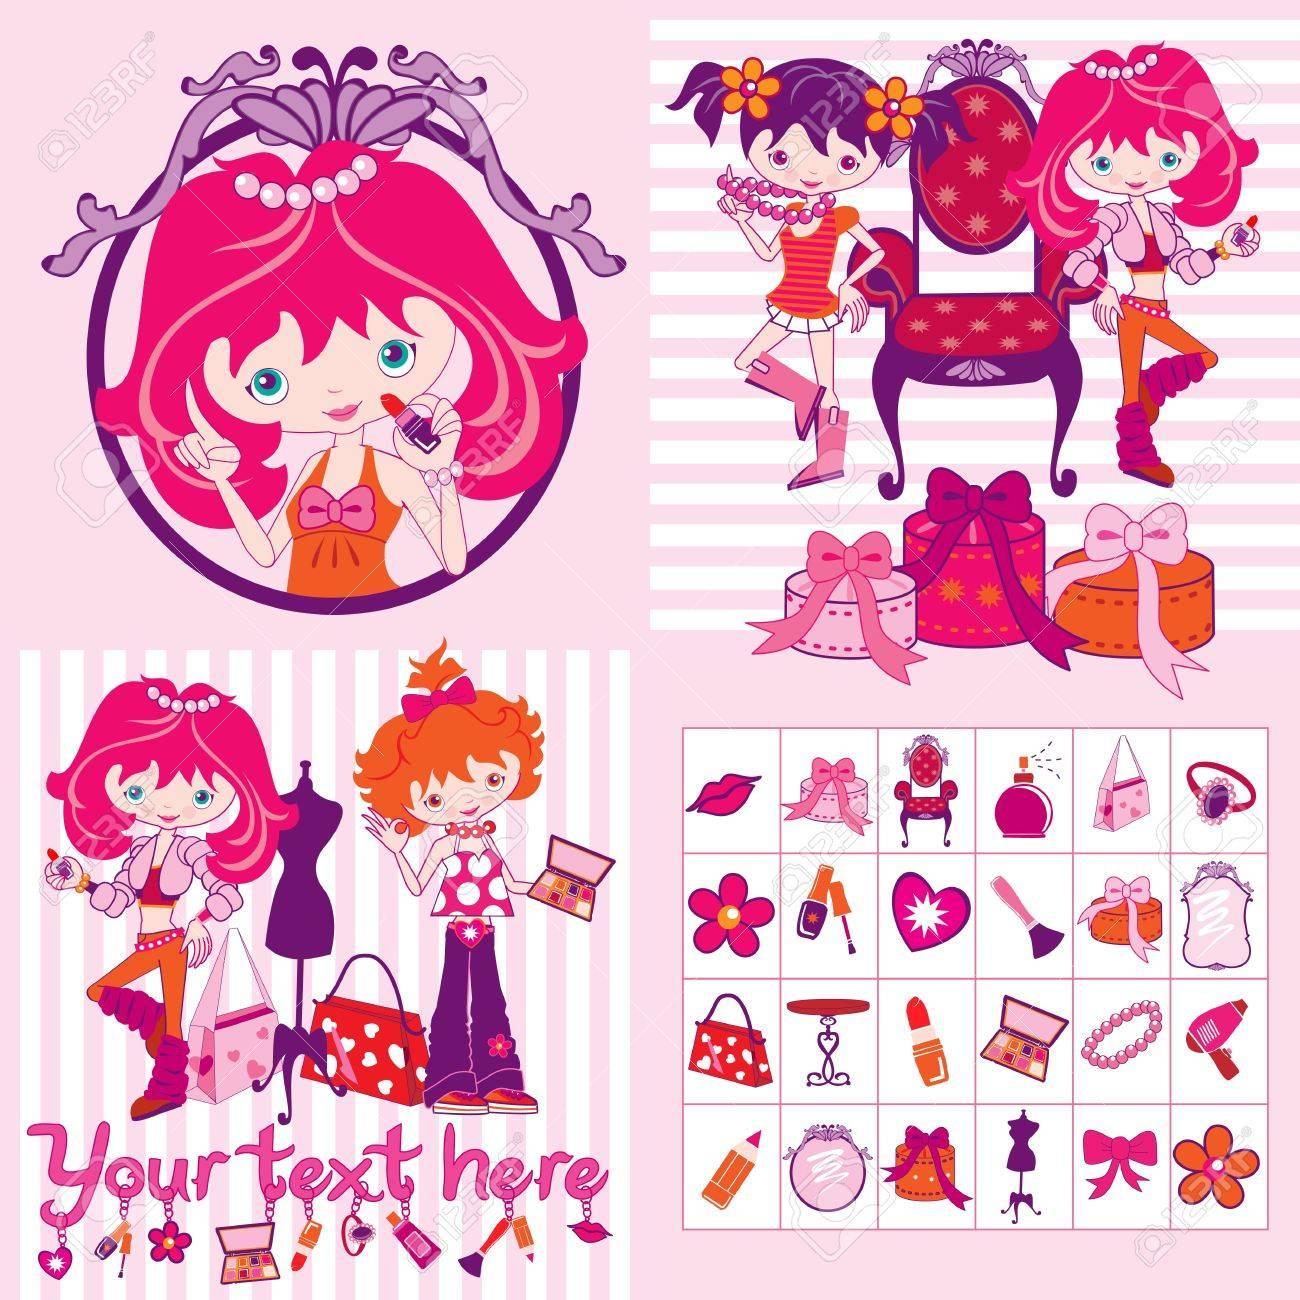 pink cartoon girls, makeup and jewelry, illustration - 14192040